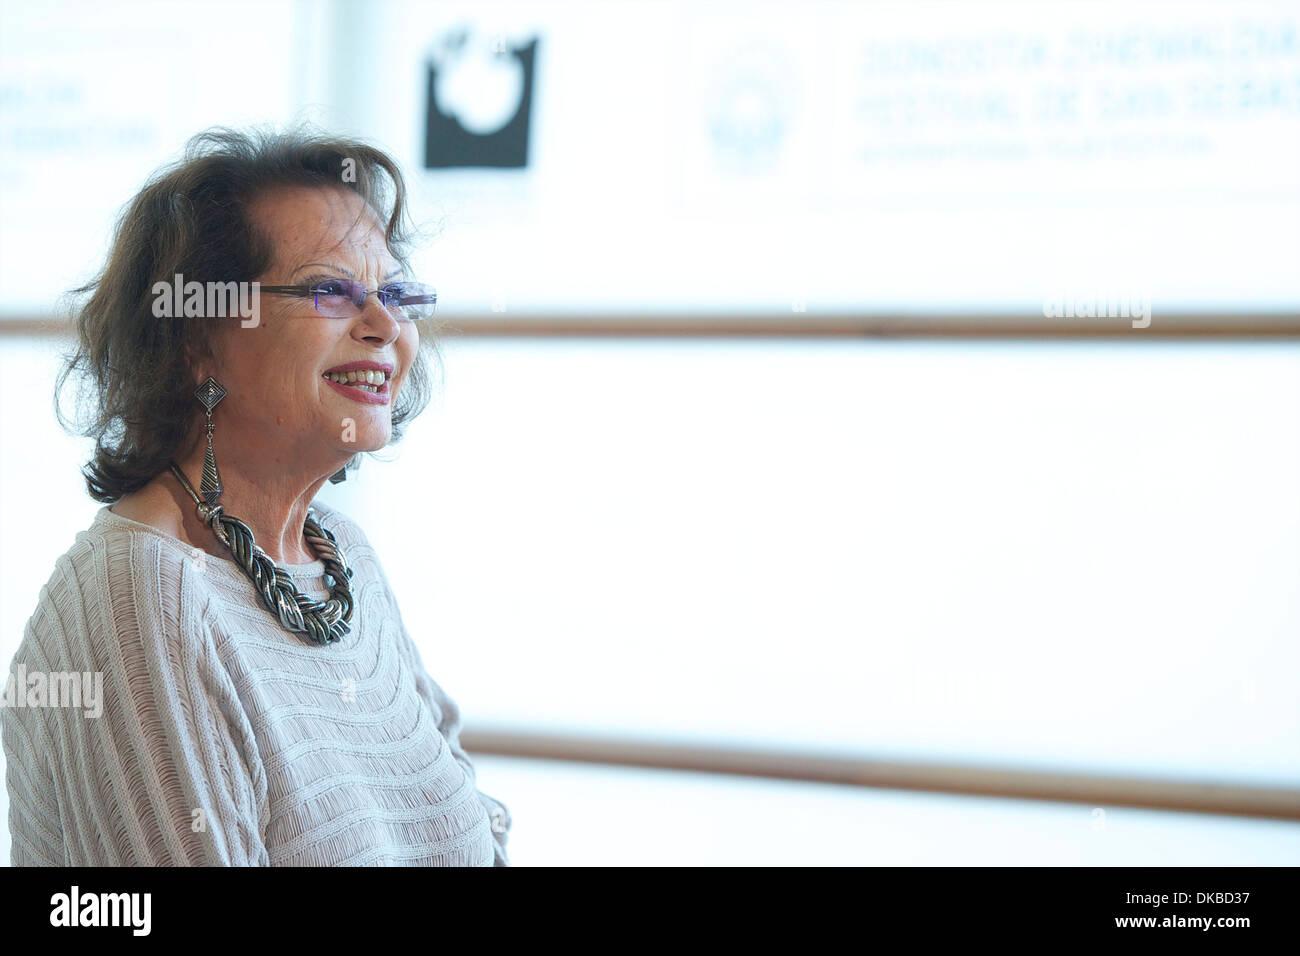 "Claudia Cardinale "" El artista y la modelo' photocall al Kursaal Palace durante il sessantesimo Festival Internazionale del Film di San Sebastian Immagini Stock"